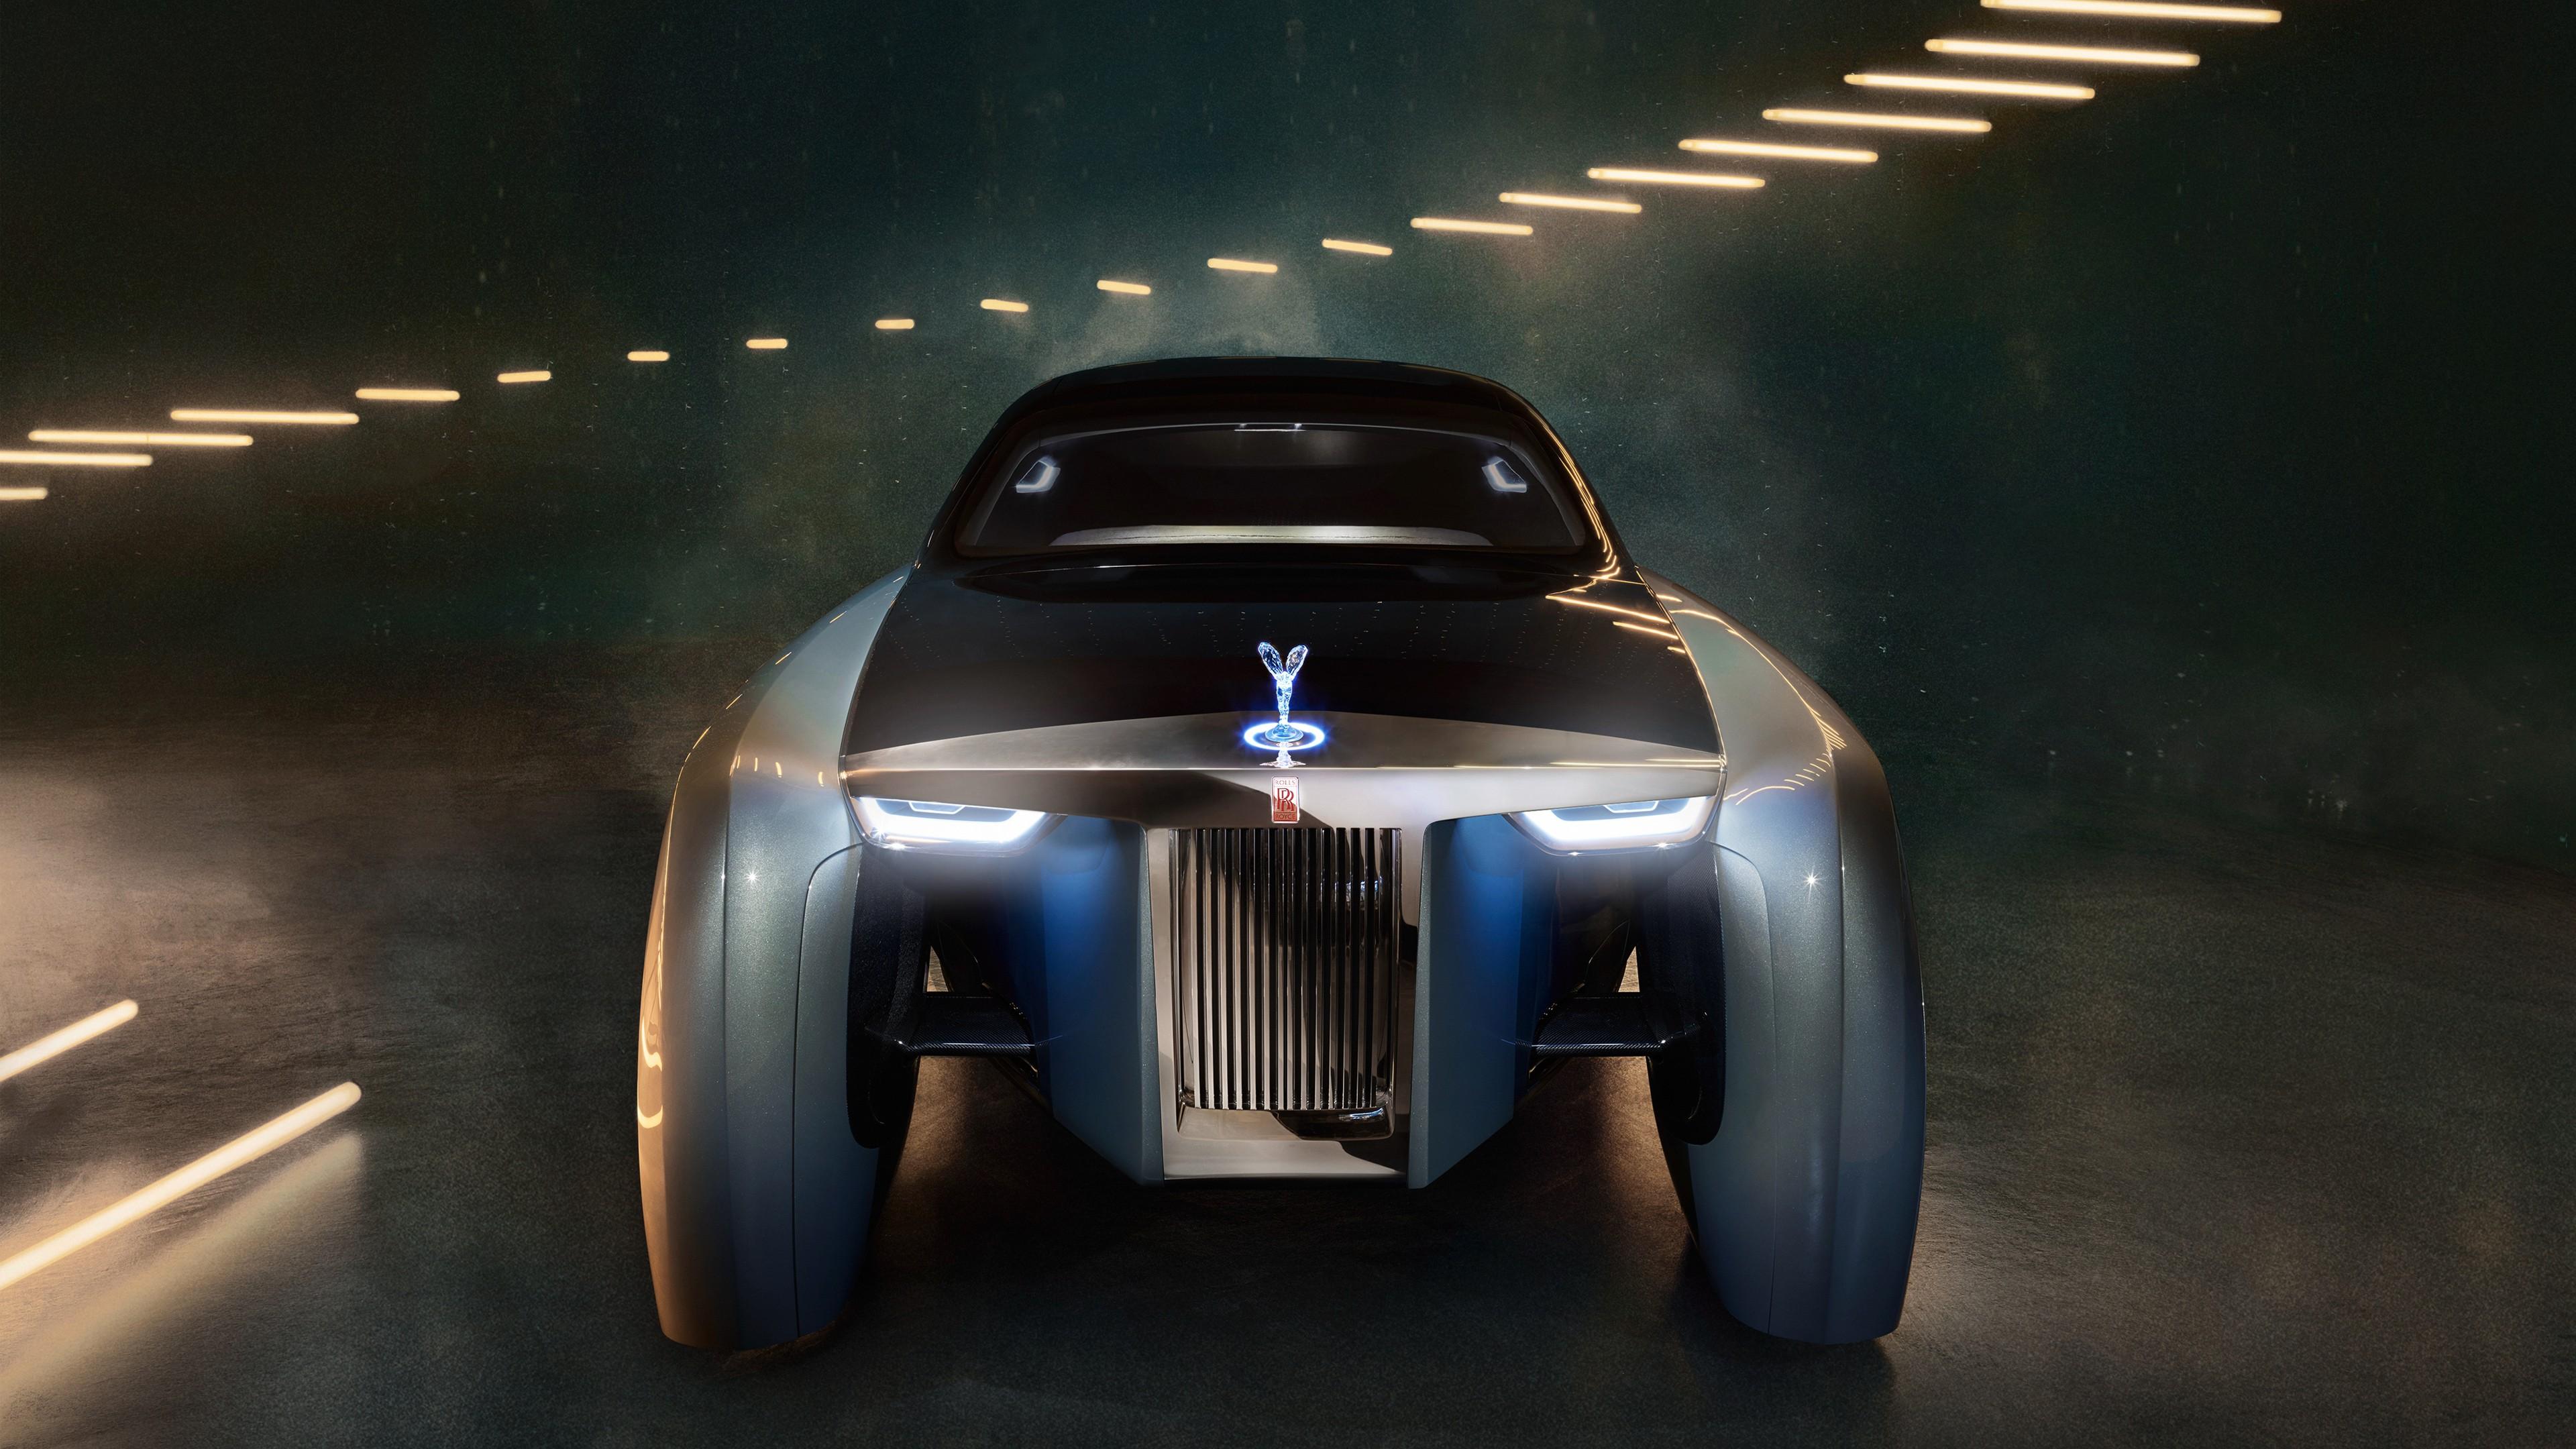 2016 Rolls Royce Vision Next 100 8 Wallpaper | HD Car ...